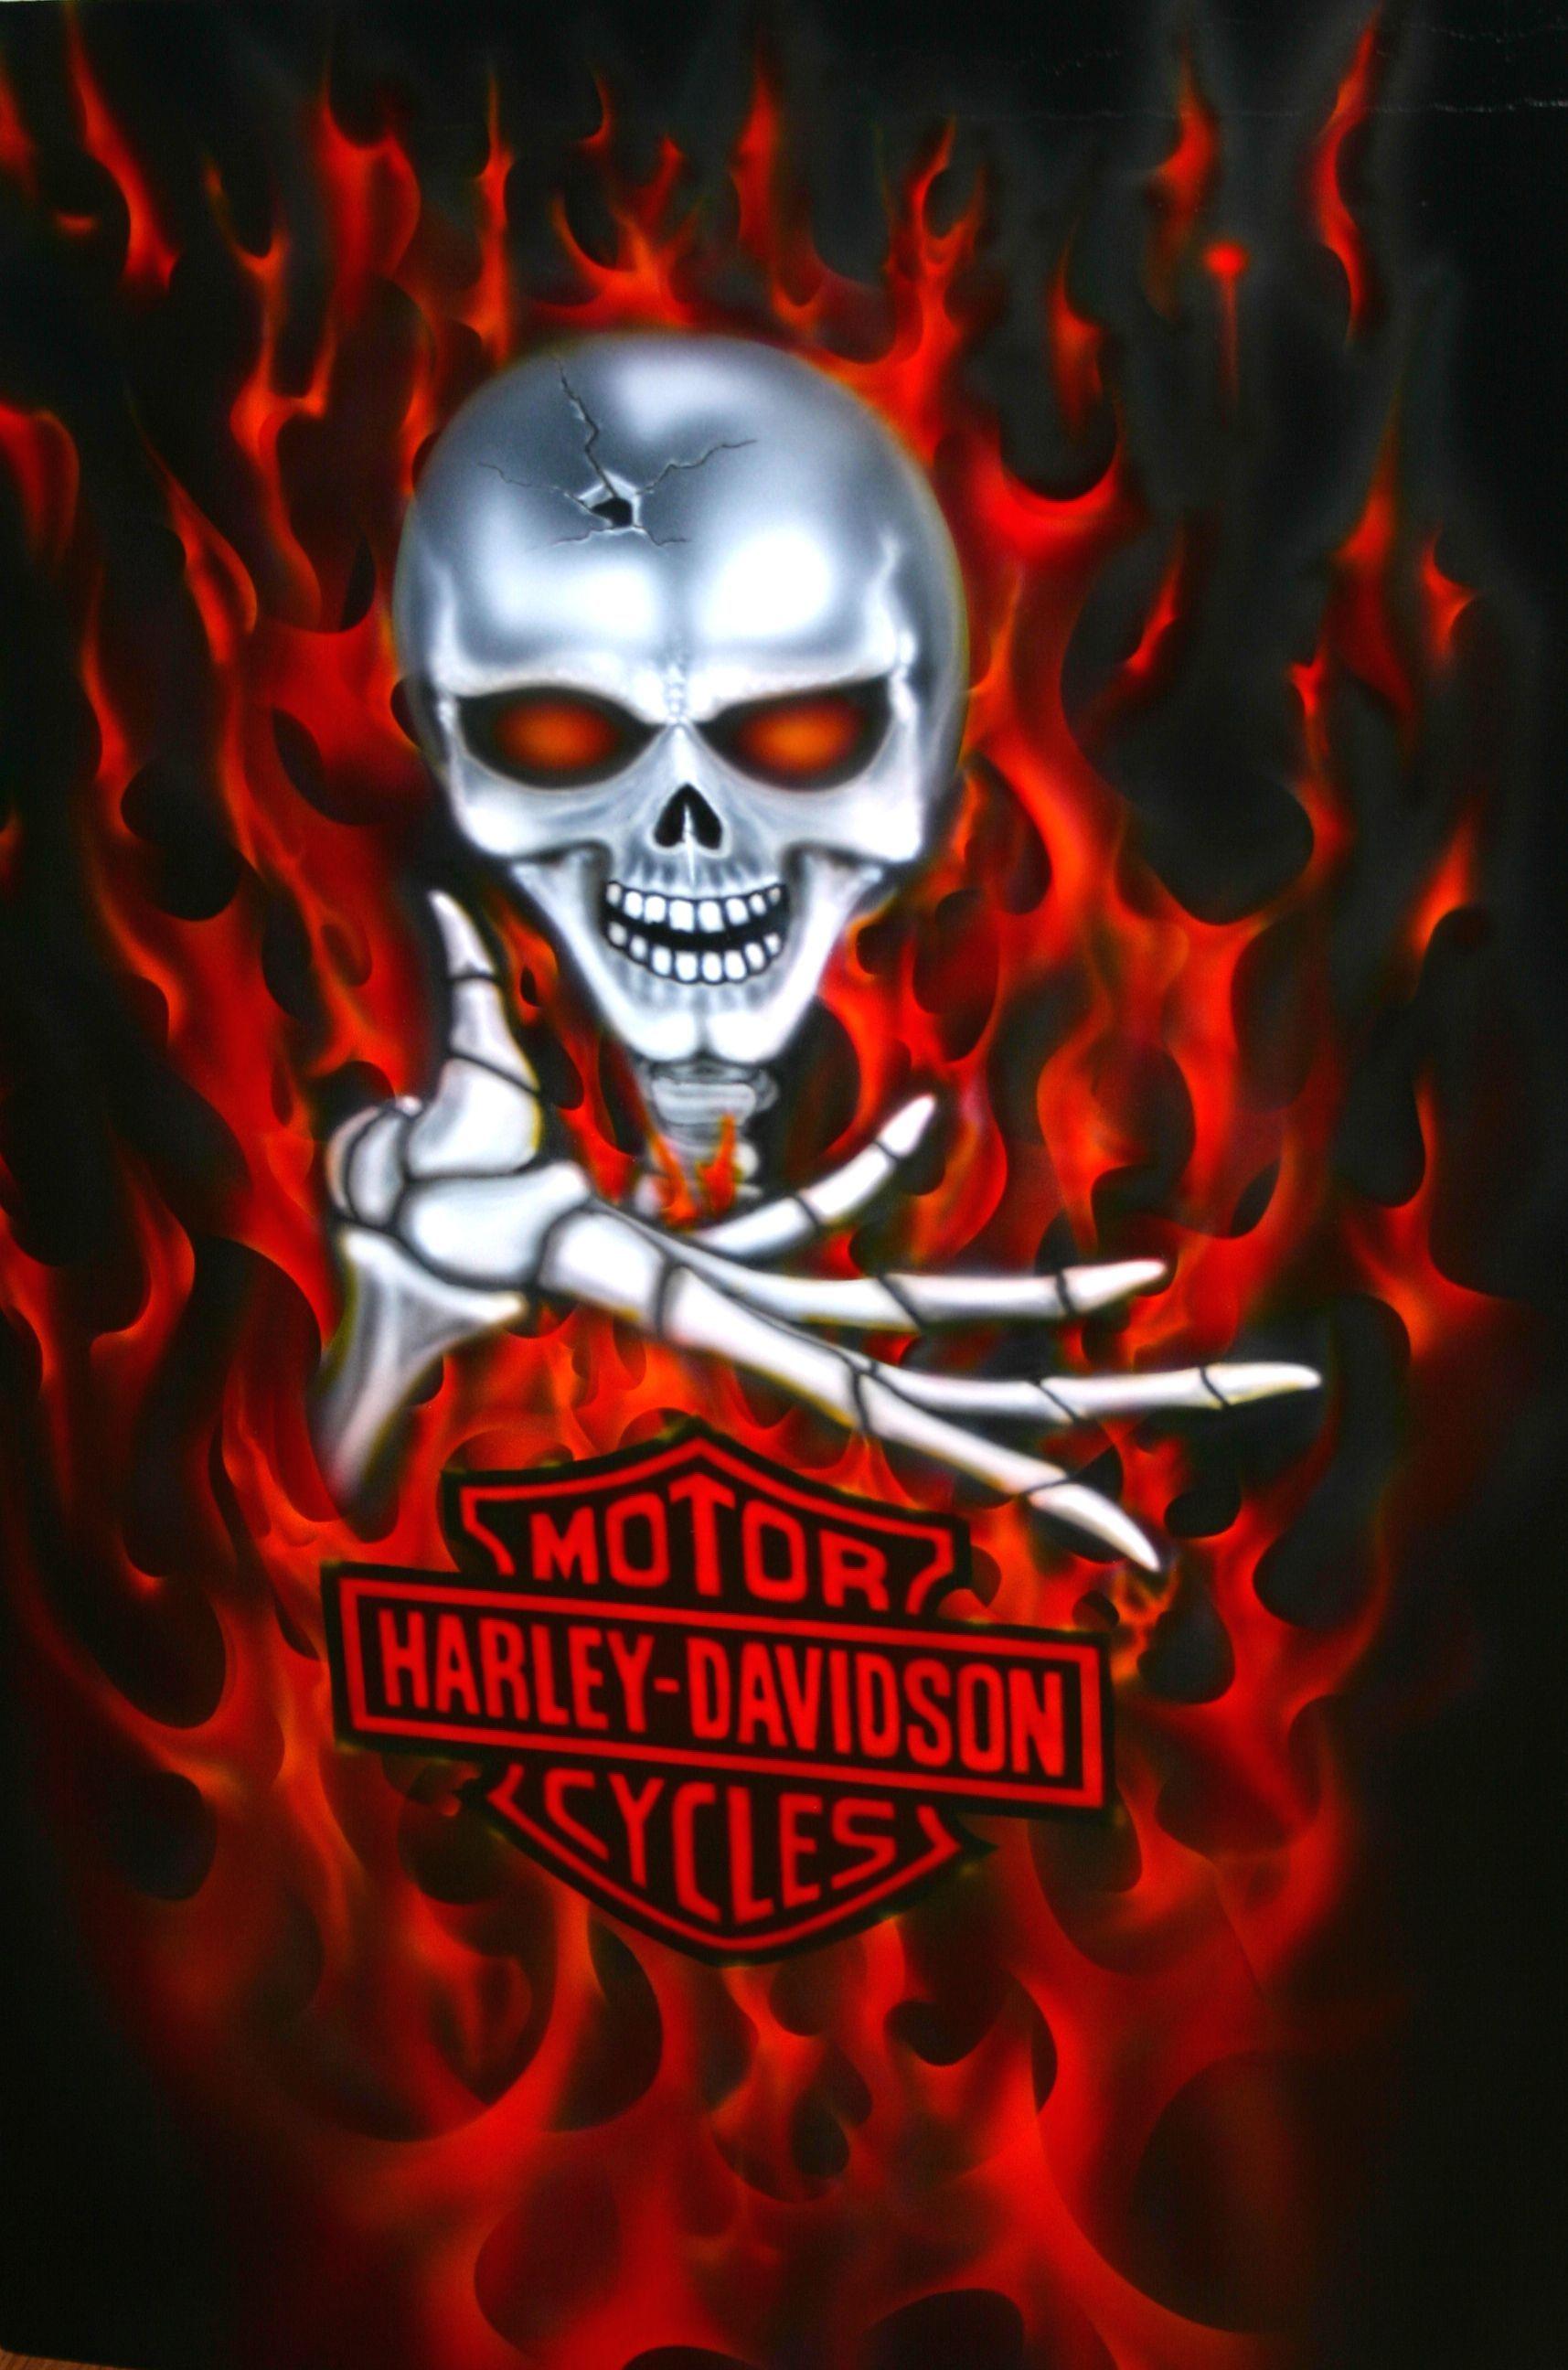 harley davidson skull logo ripped metal effect on this. Black Bedroom Furniture Sets. Home Design Ideas